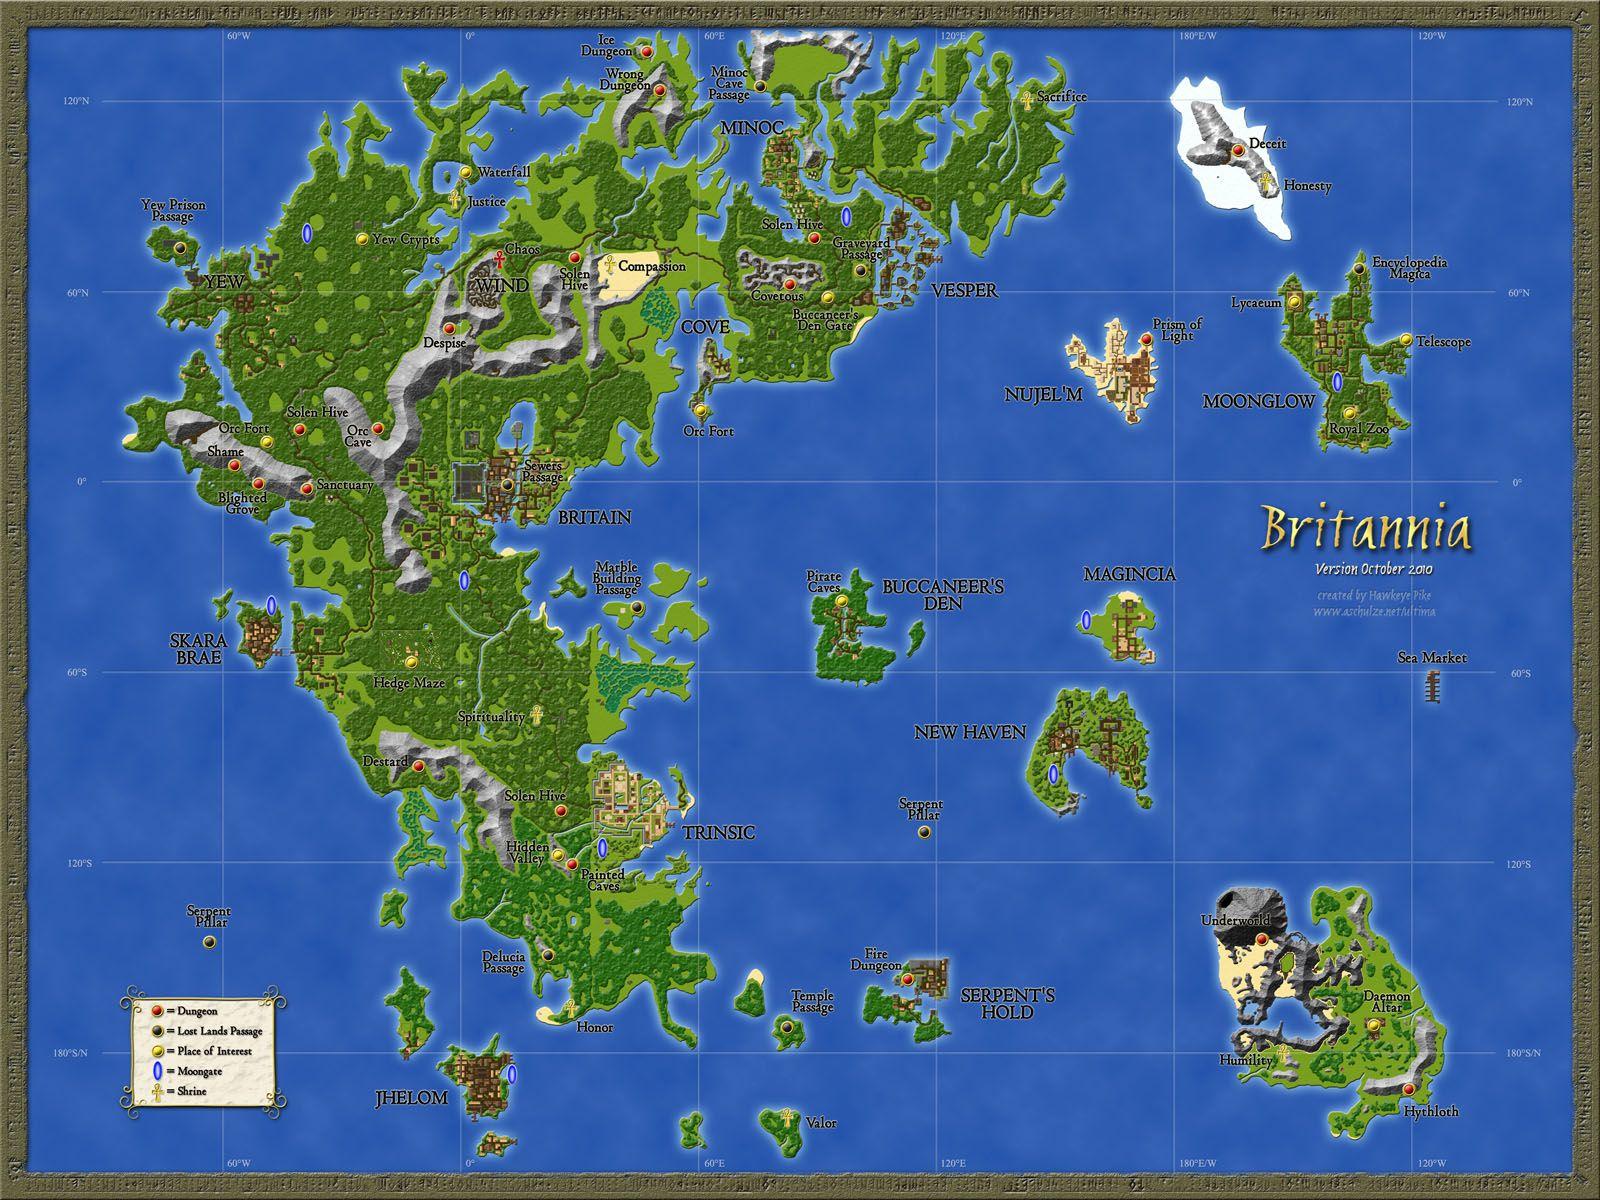 Ultima Online World Map Ultima Online Map | Ultima online, Game art, Funny games